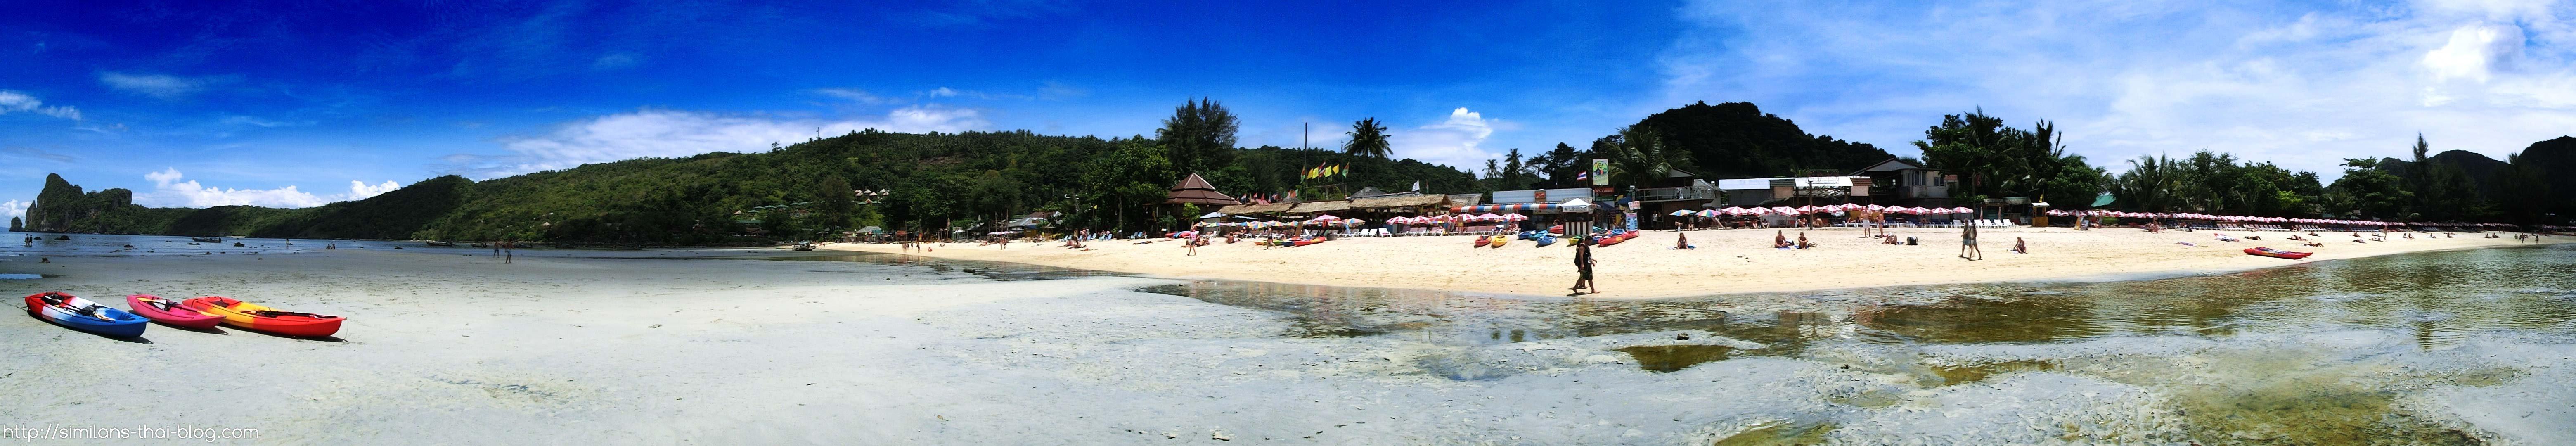 koh-phi-phi-beach-panorama